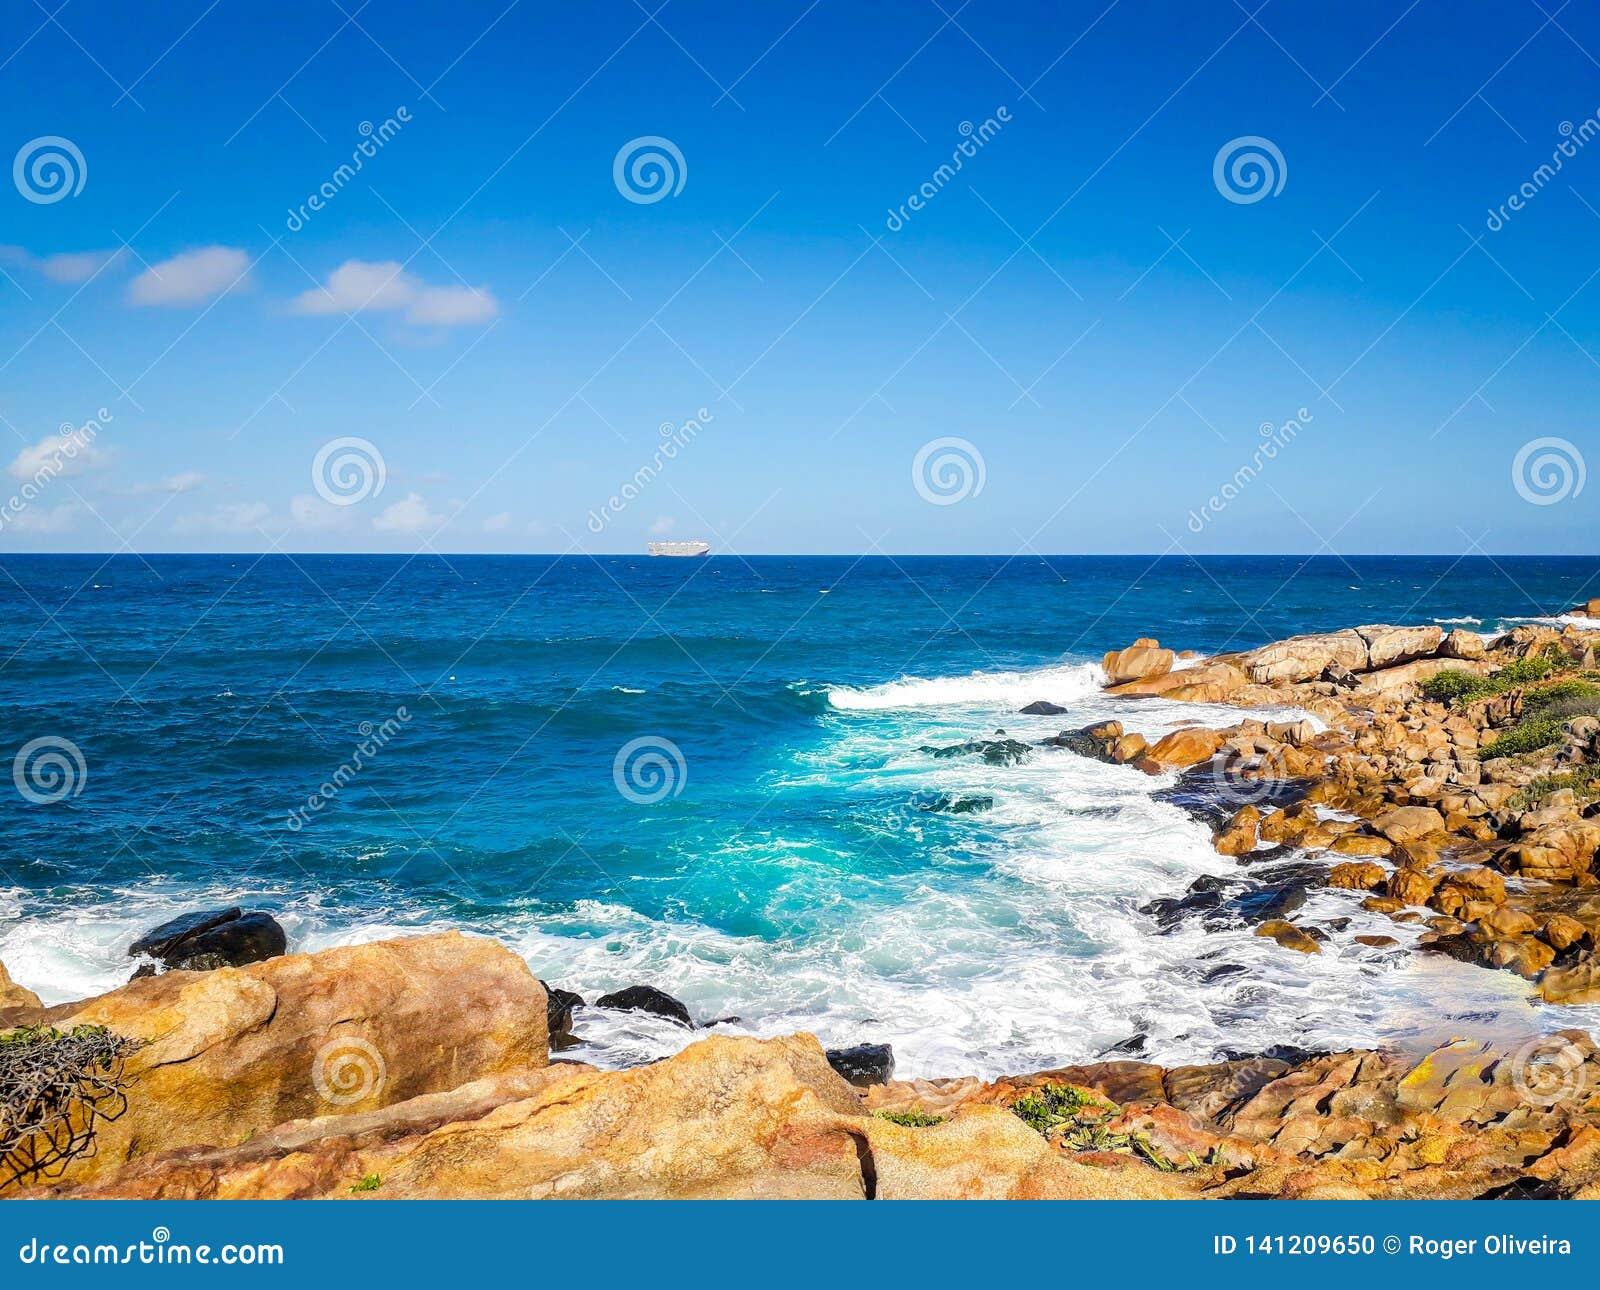 Calhetas beach on interior of Pernambuco, Brazil.